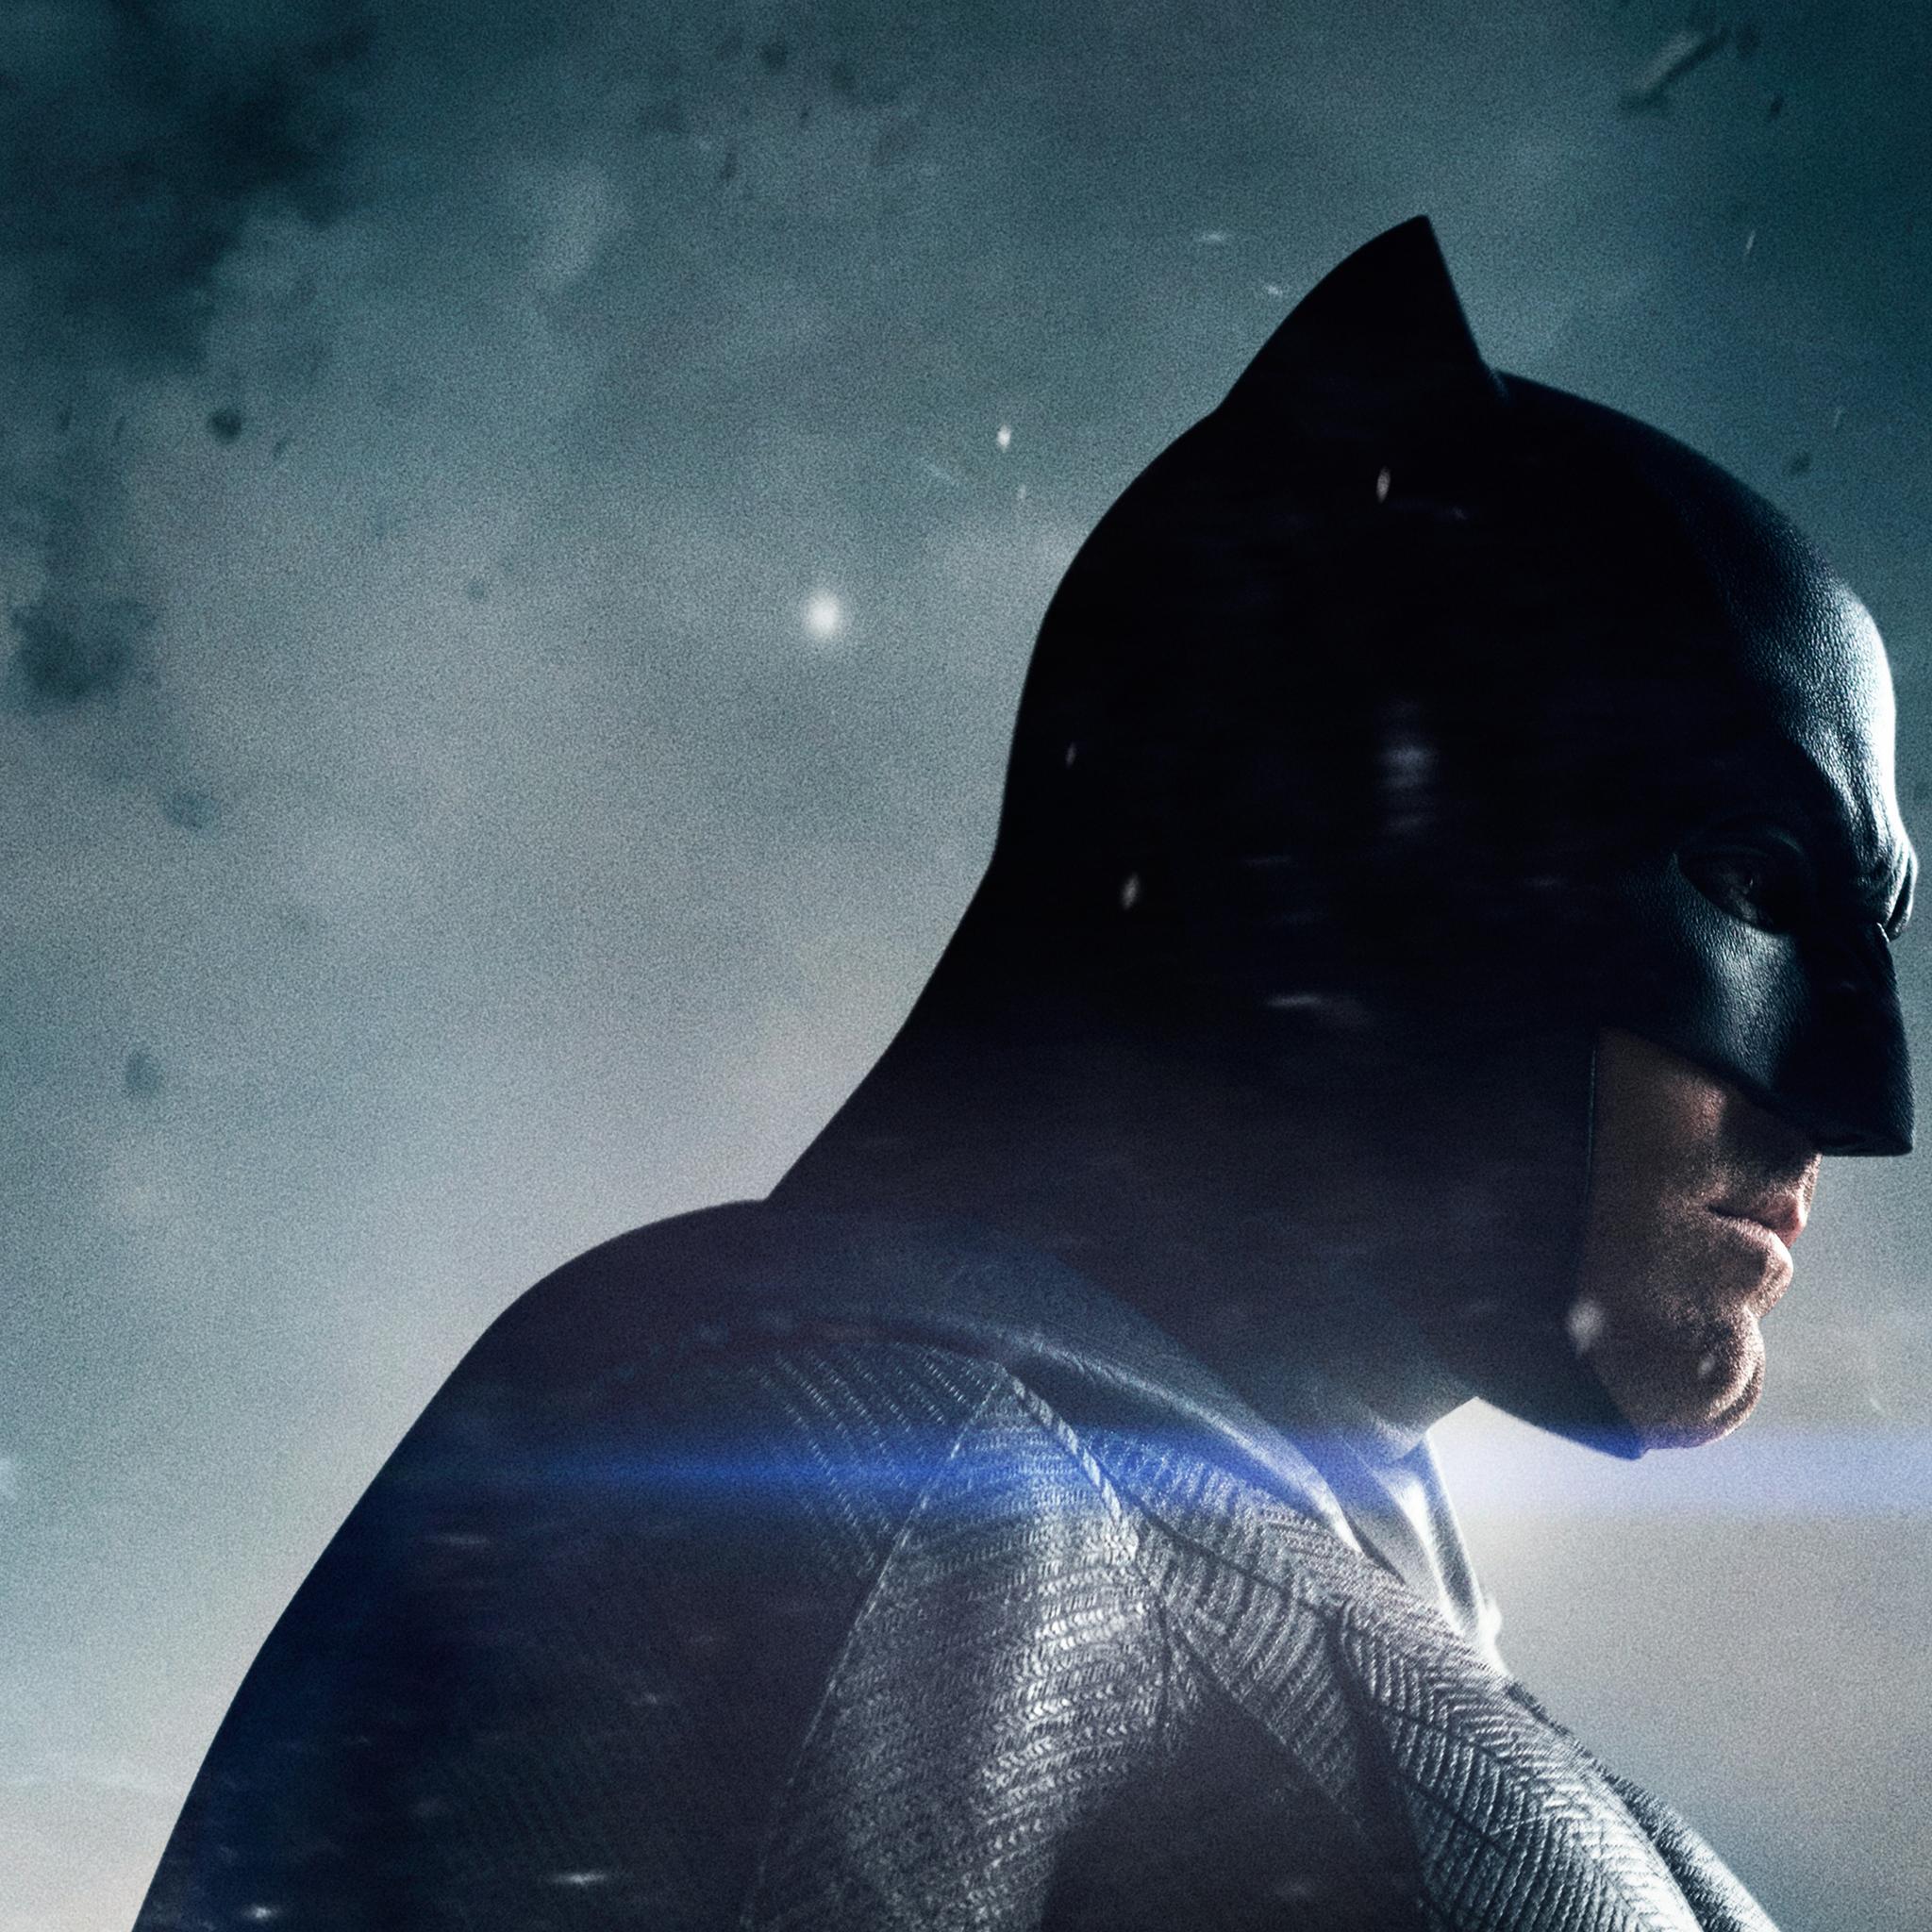 batman-v-superman-dawn-of-justice-5k-v8.jpg